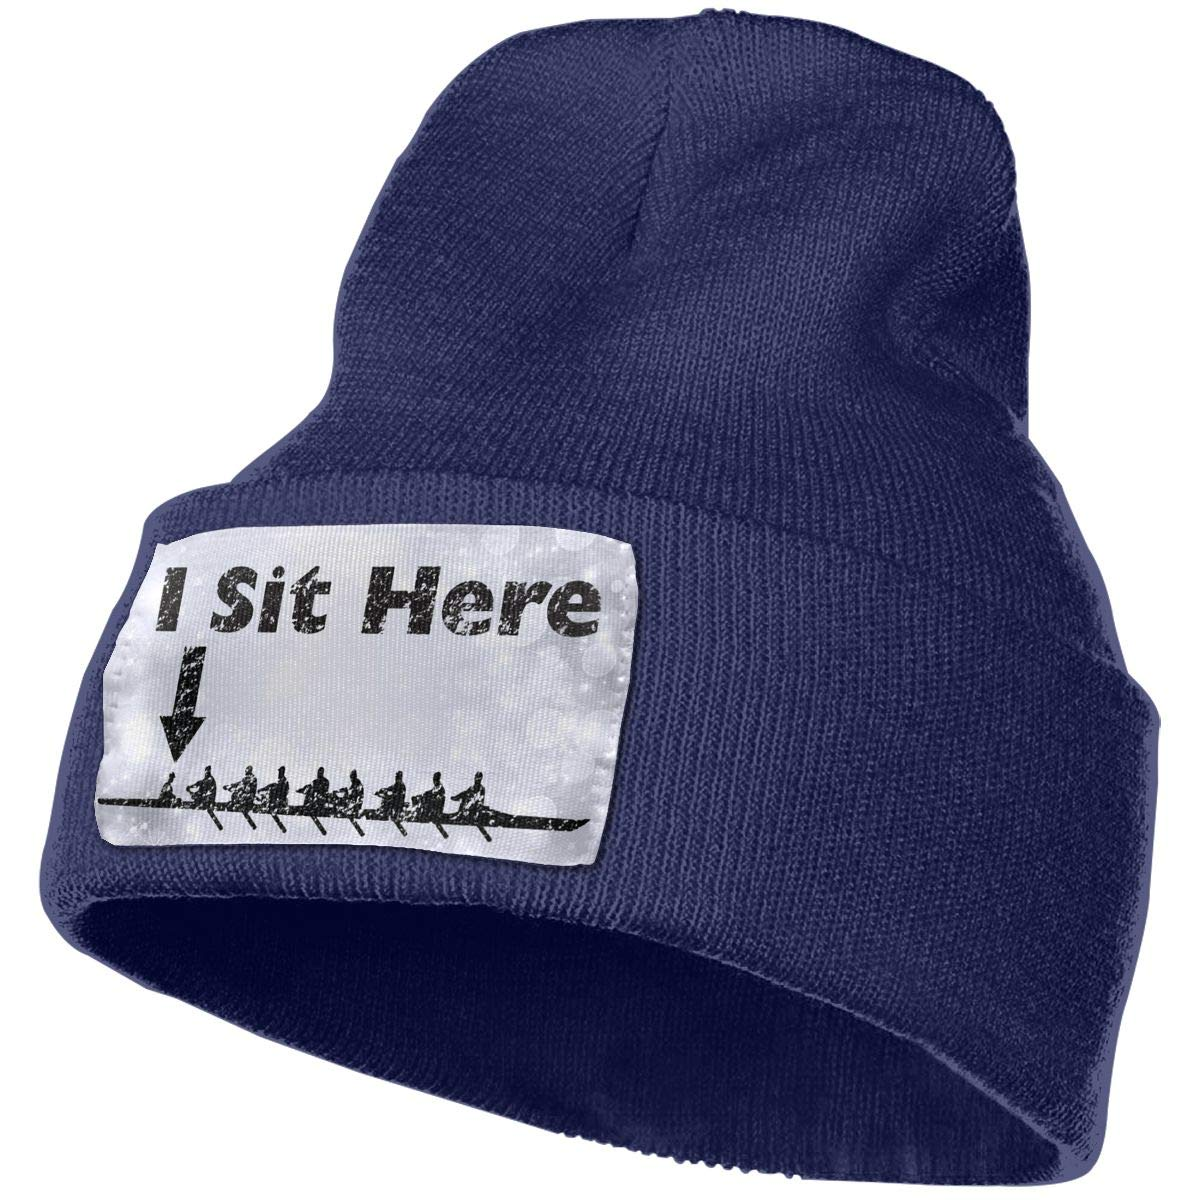 I Sit Here Coxswain Rowing Crew Pride Men/&Women Warm Winter Knit Plain Beanie Hat Skull Cap Acrylic Knit Cuff Hat